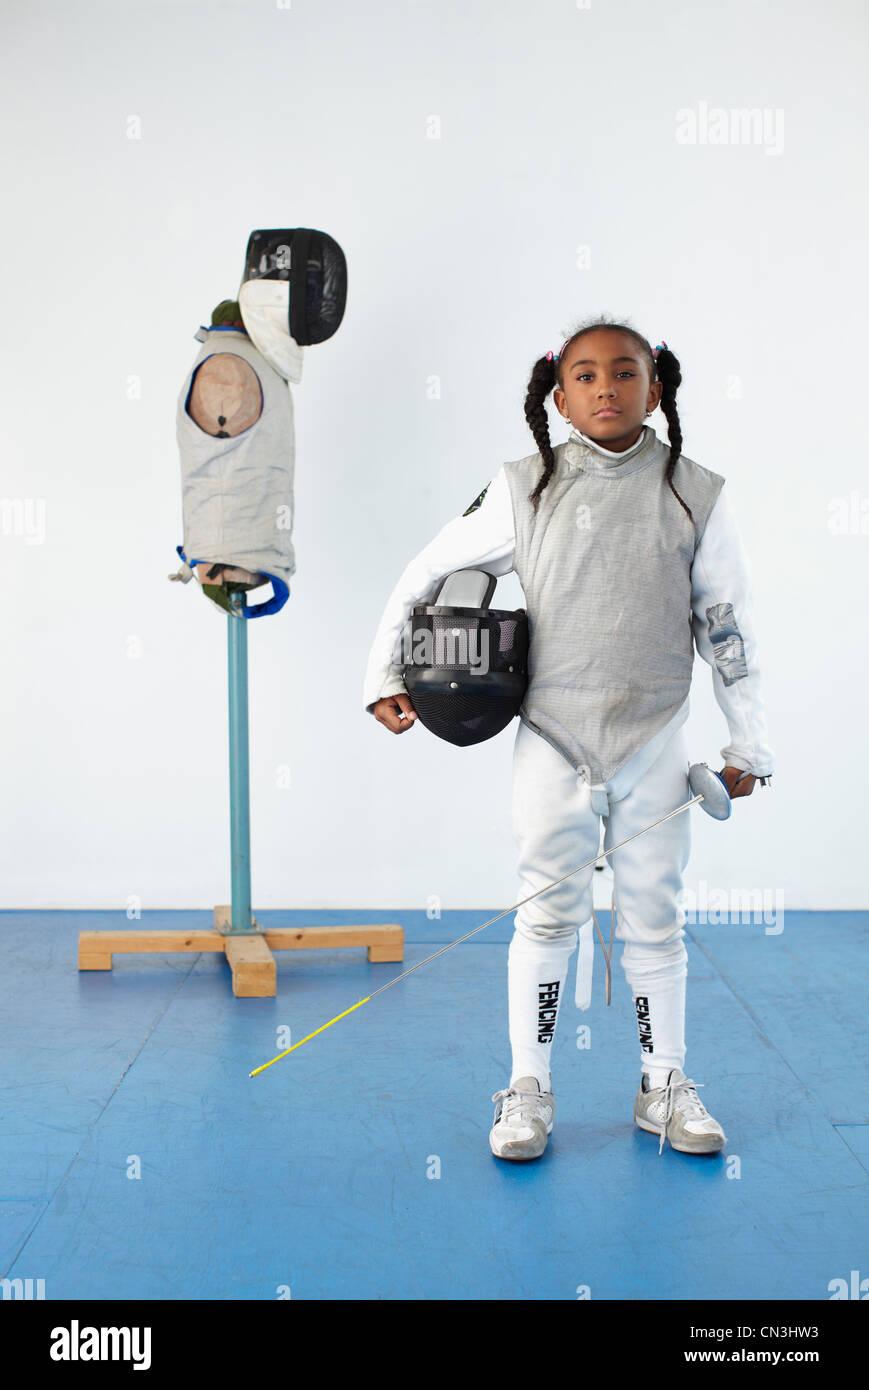 Retrato de niña en de esgrima Imagen De Stock